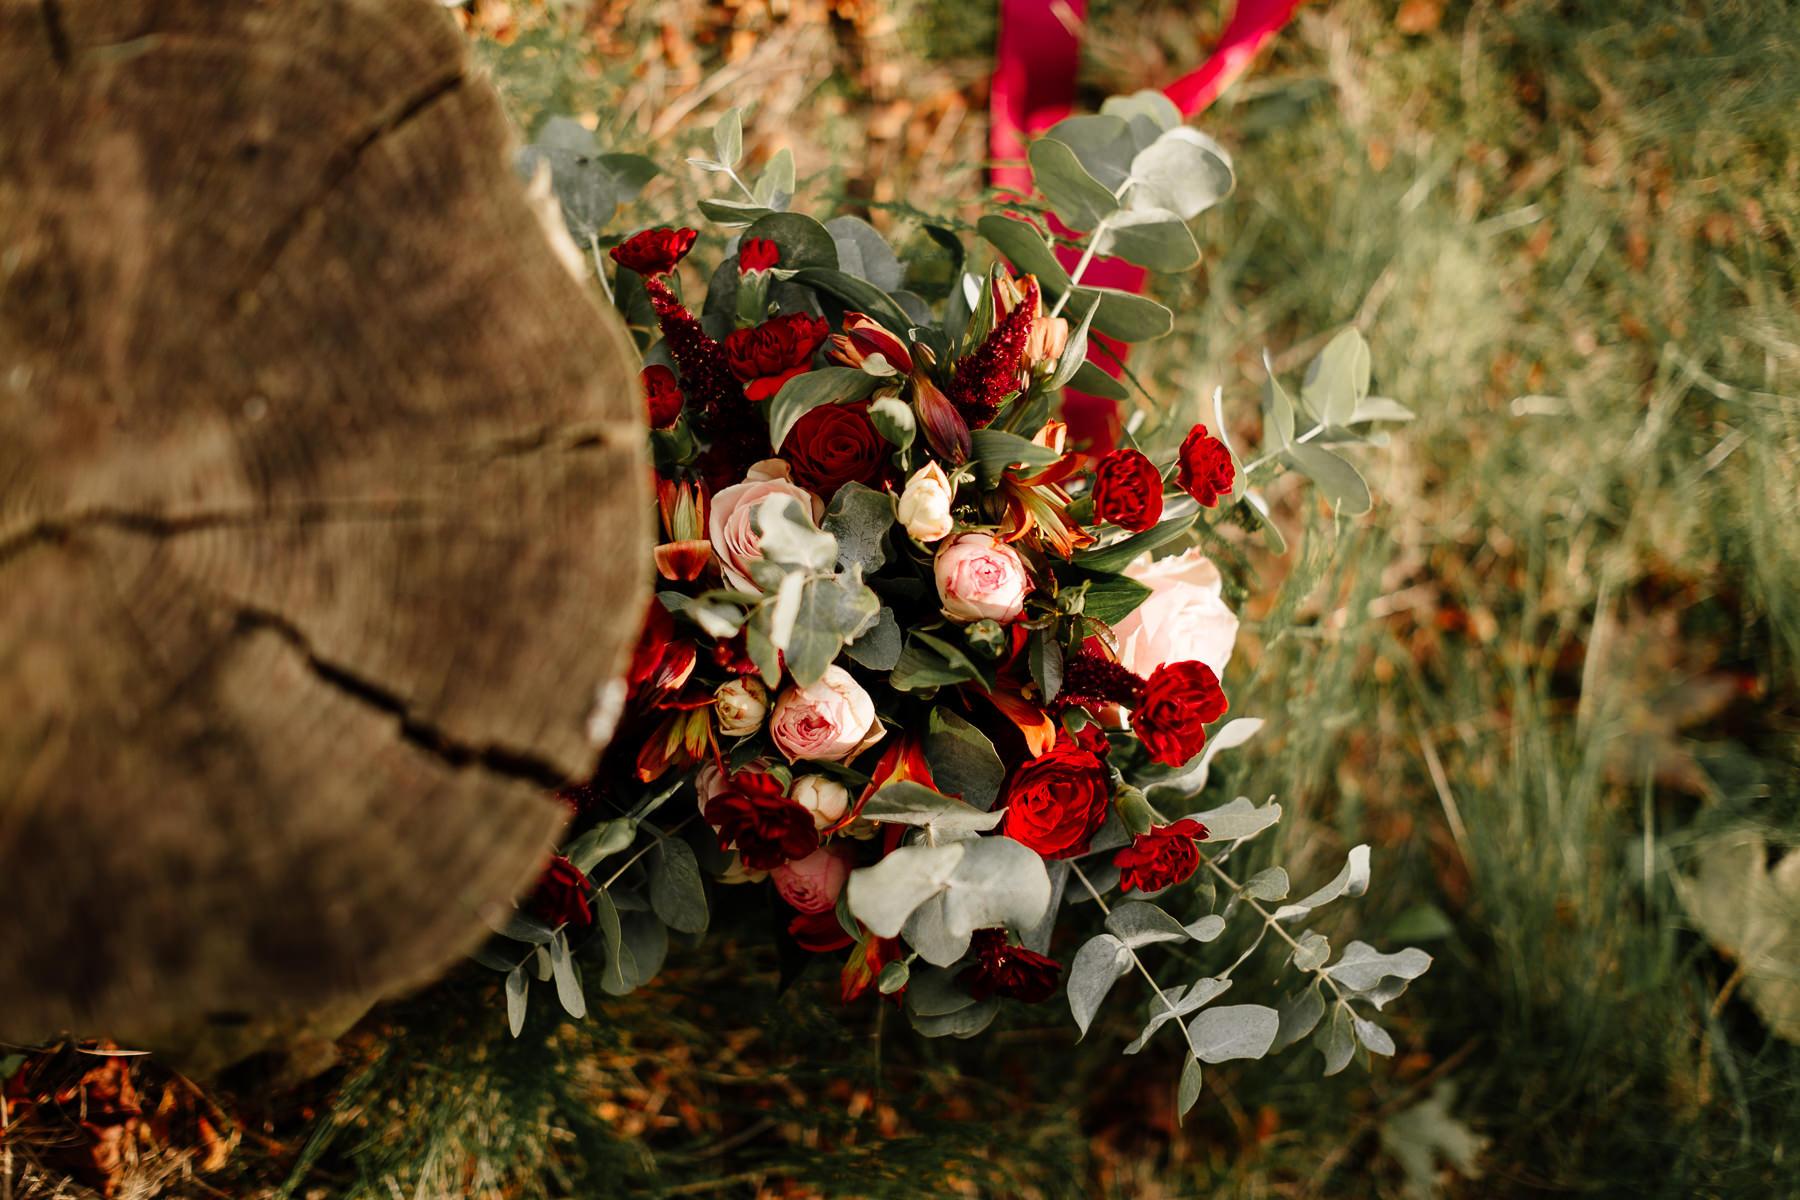 kwiaciarnia sempreverde szczecin